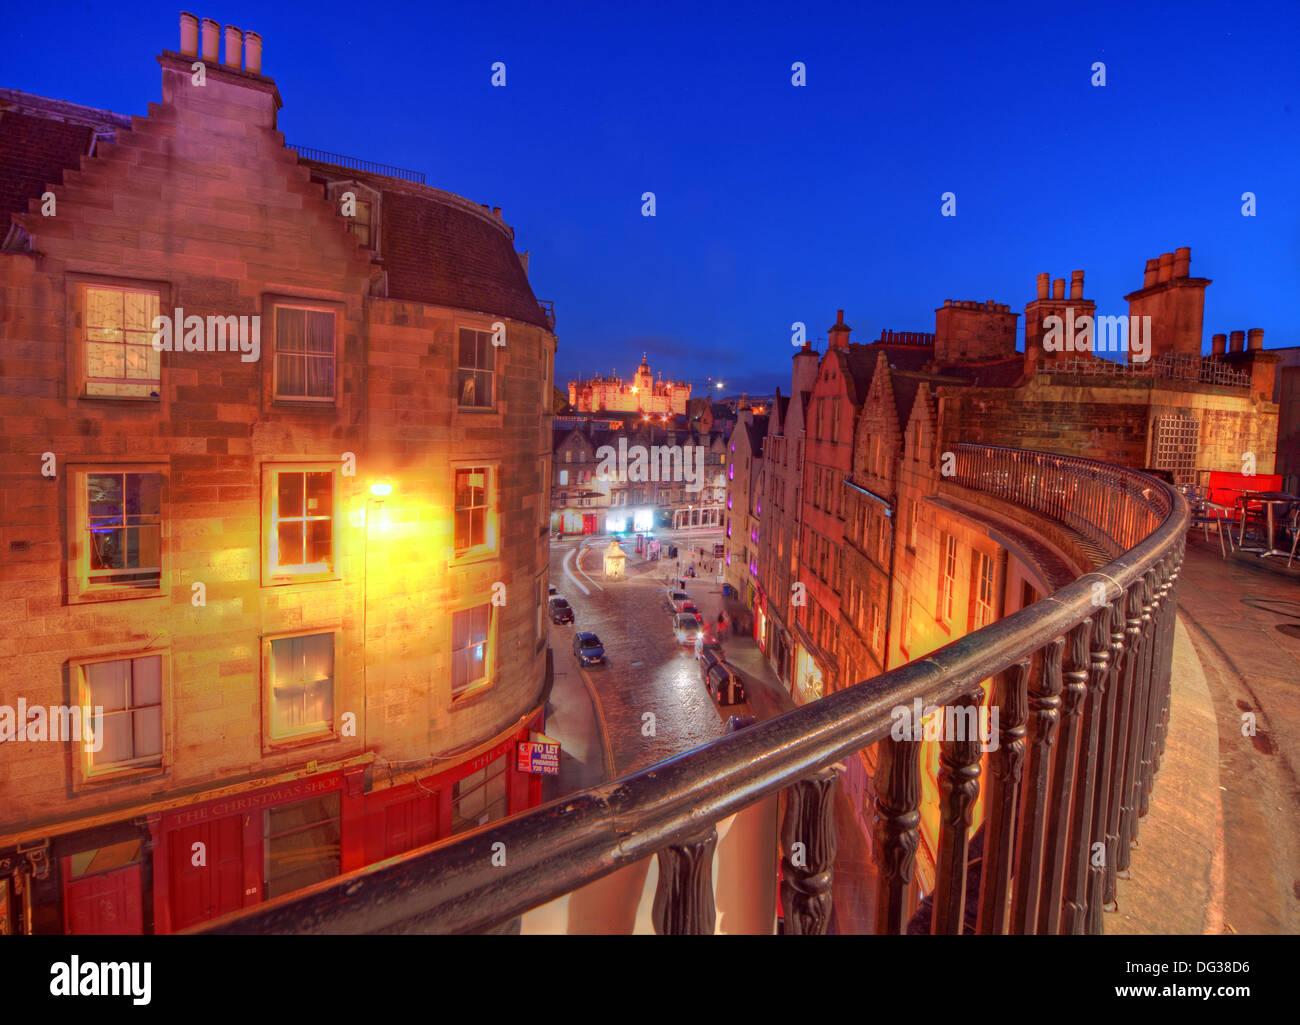 Railing at top of Victoria Street Edinburgh City Scotland UK at dusk Night Shot Stock Photo